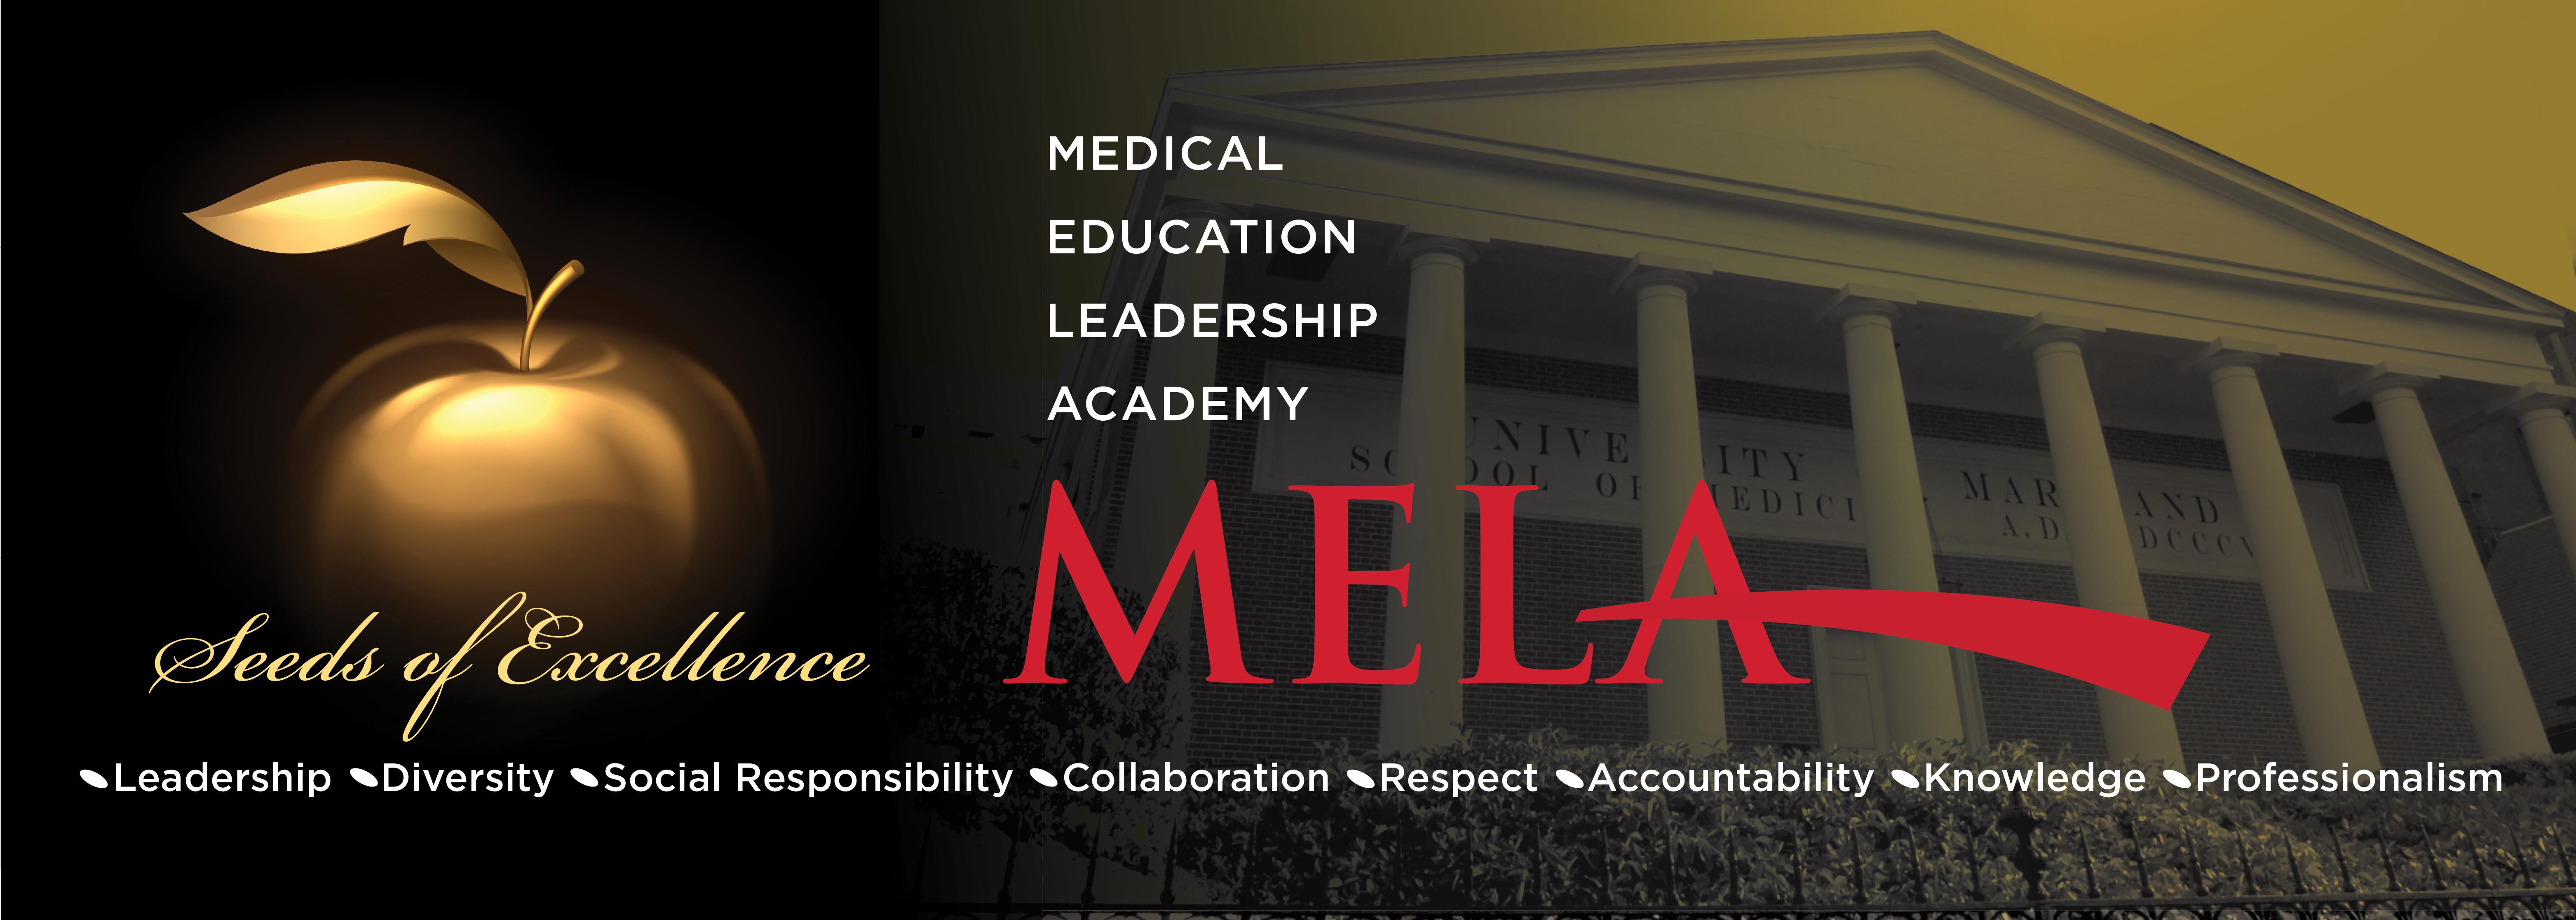 Medical Education Leadership Academy